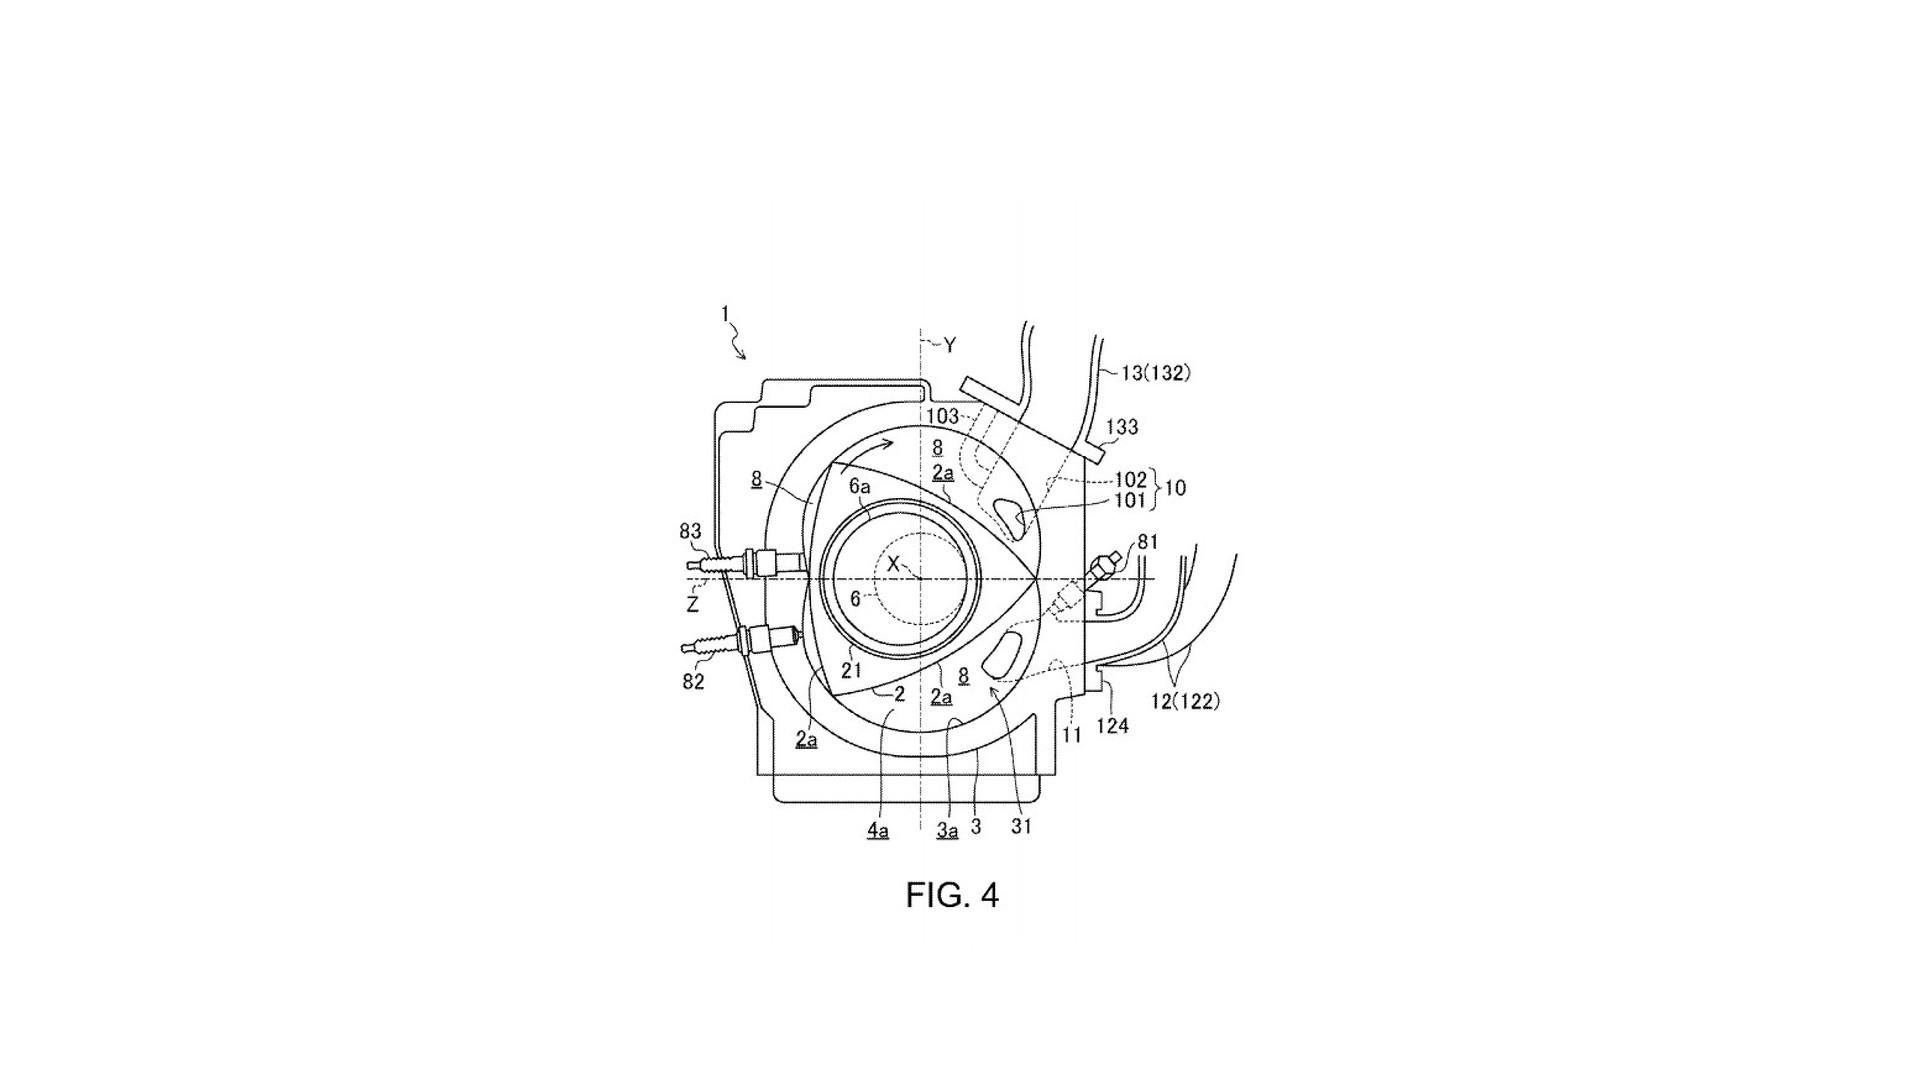 rotary engine diagram mazda patents a new rotary engine